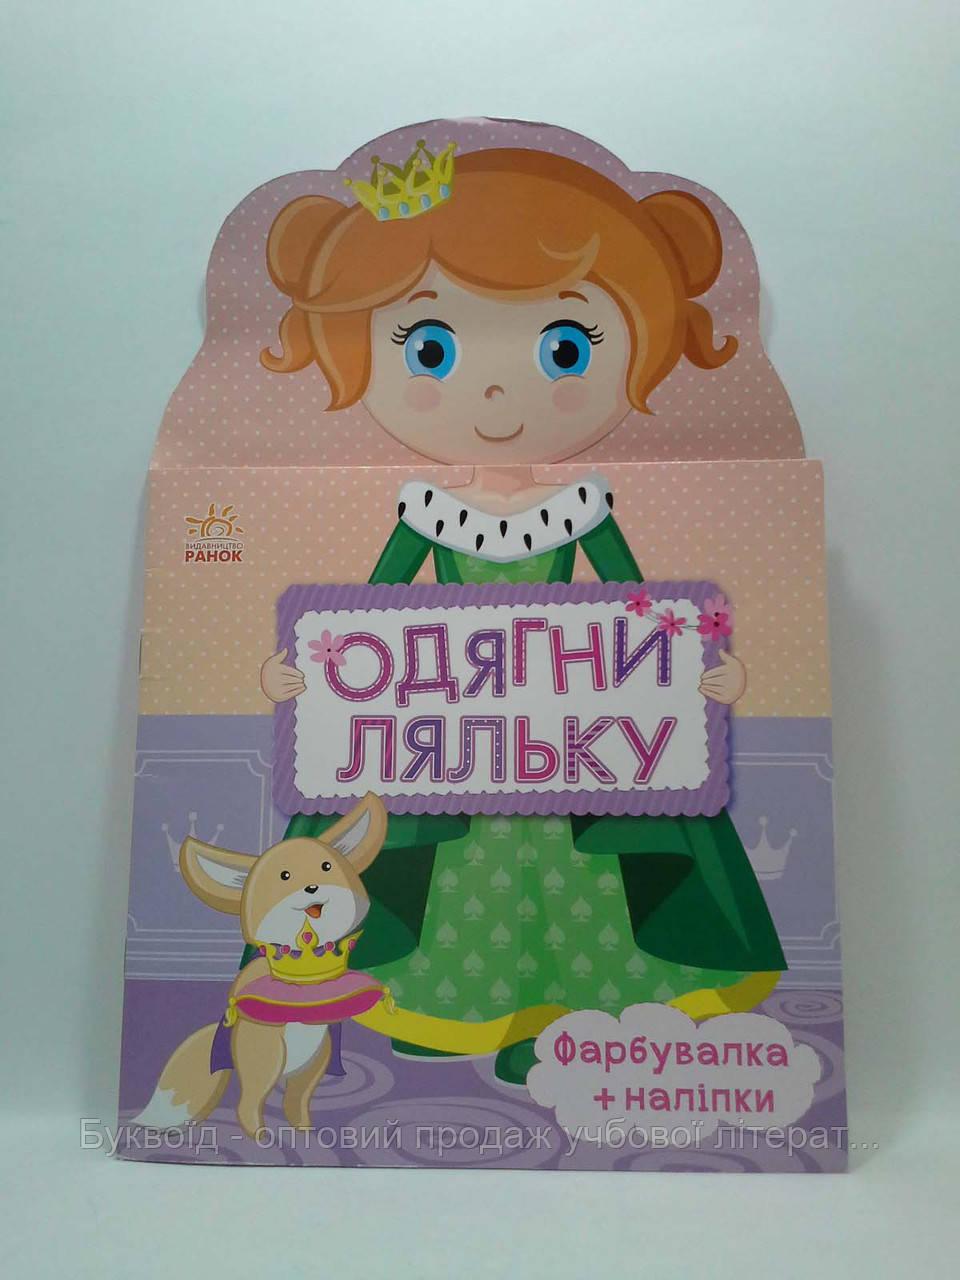 Ранок Одягни ляльку новаПринцеса